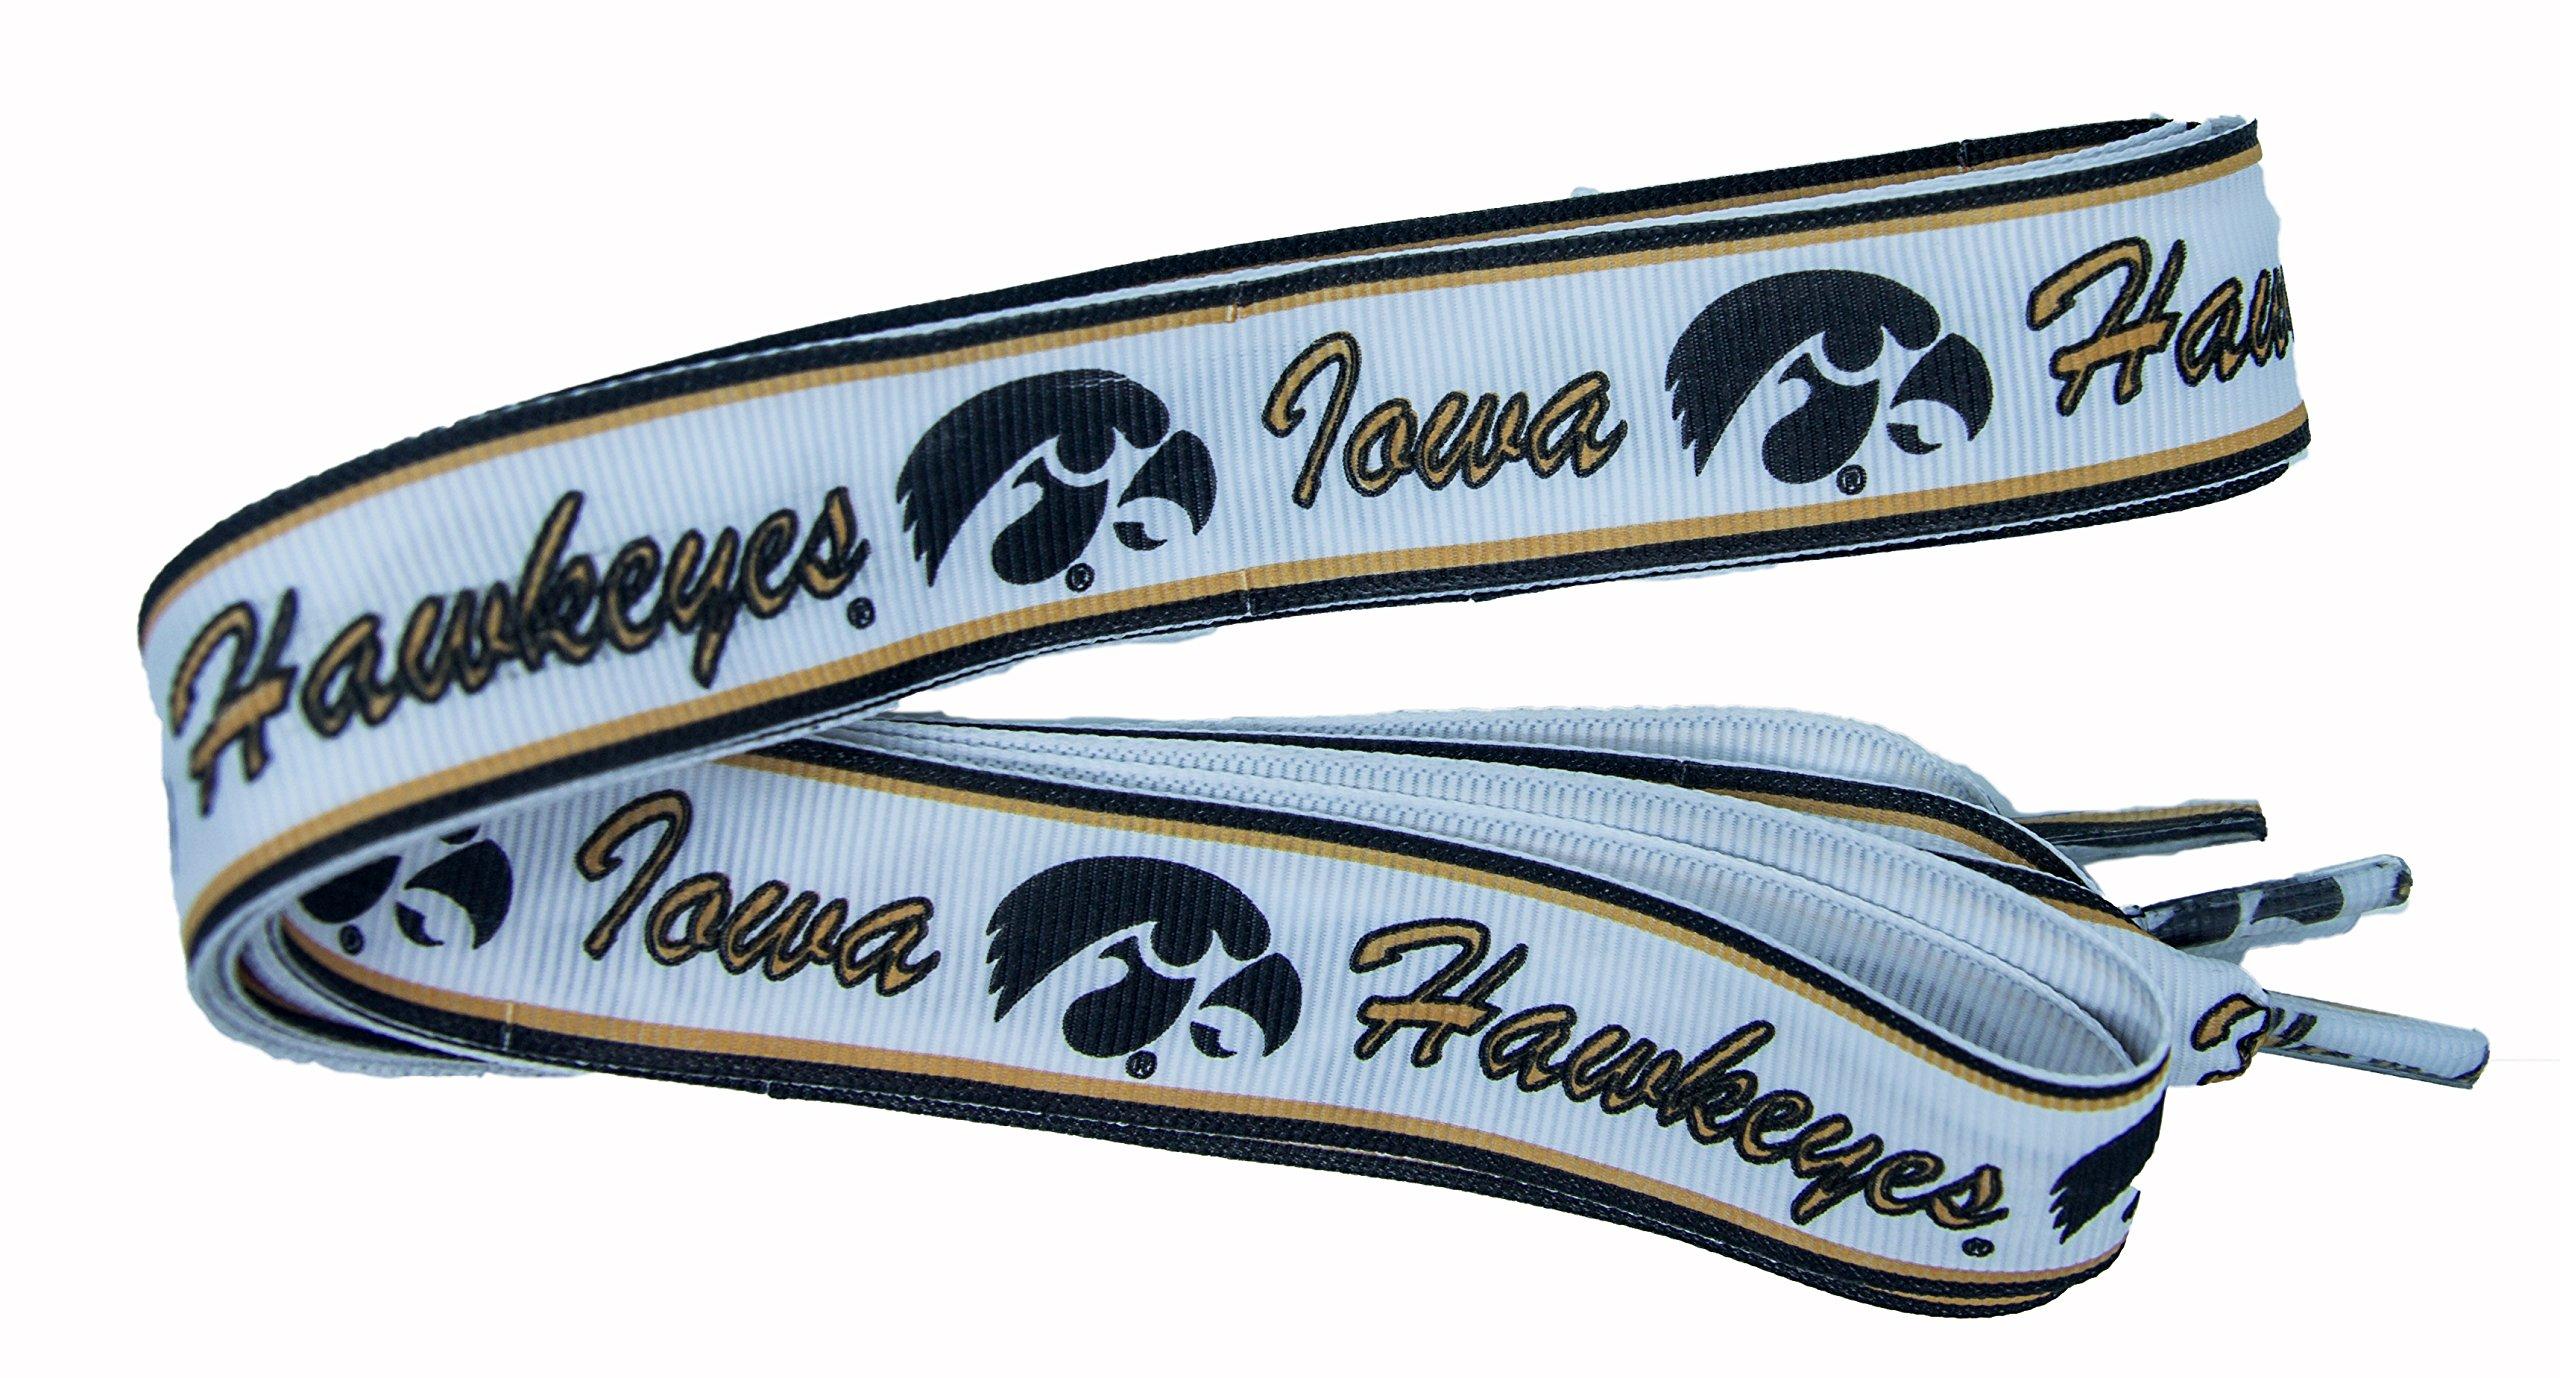 NCAA Iowa Hawkeyes Shoelaces, Yellow Gold/Black, One Size